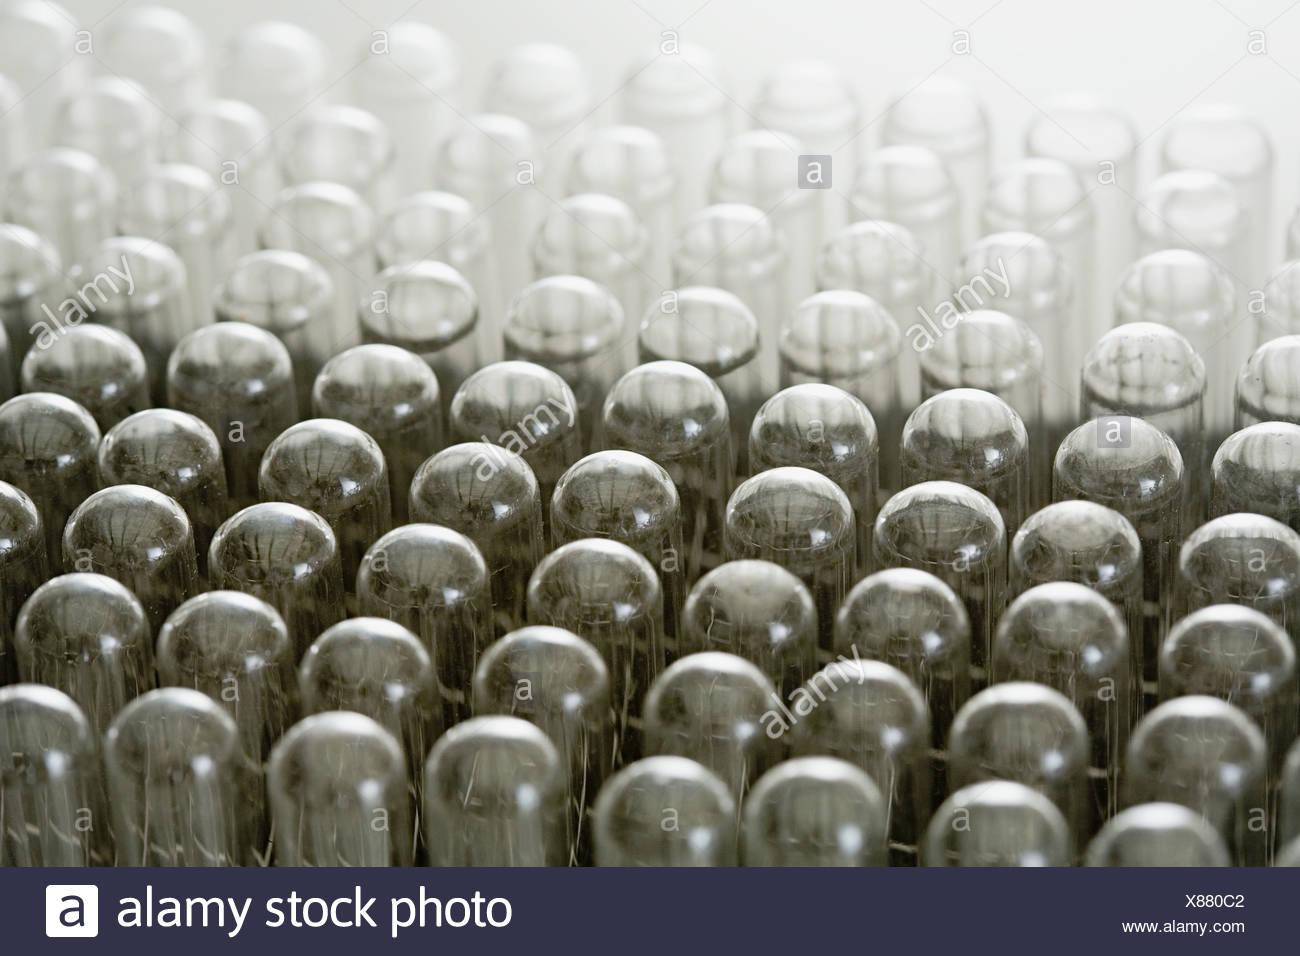 Test tubes - Stock Image